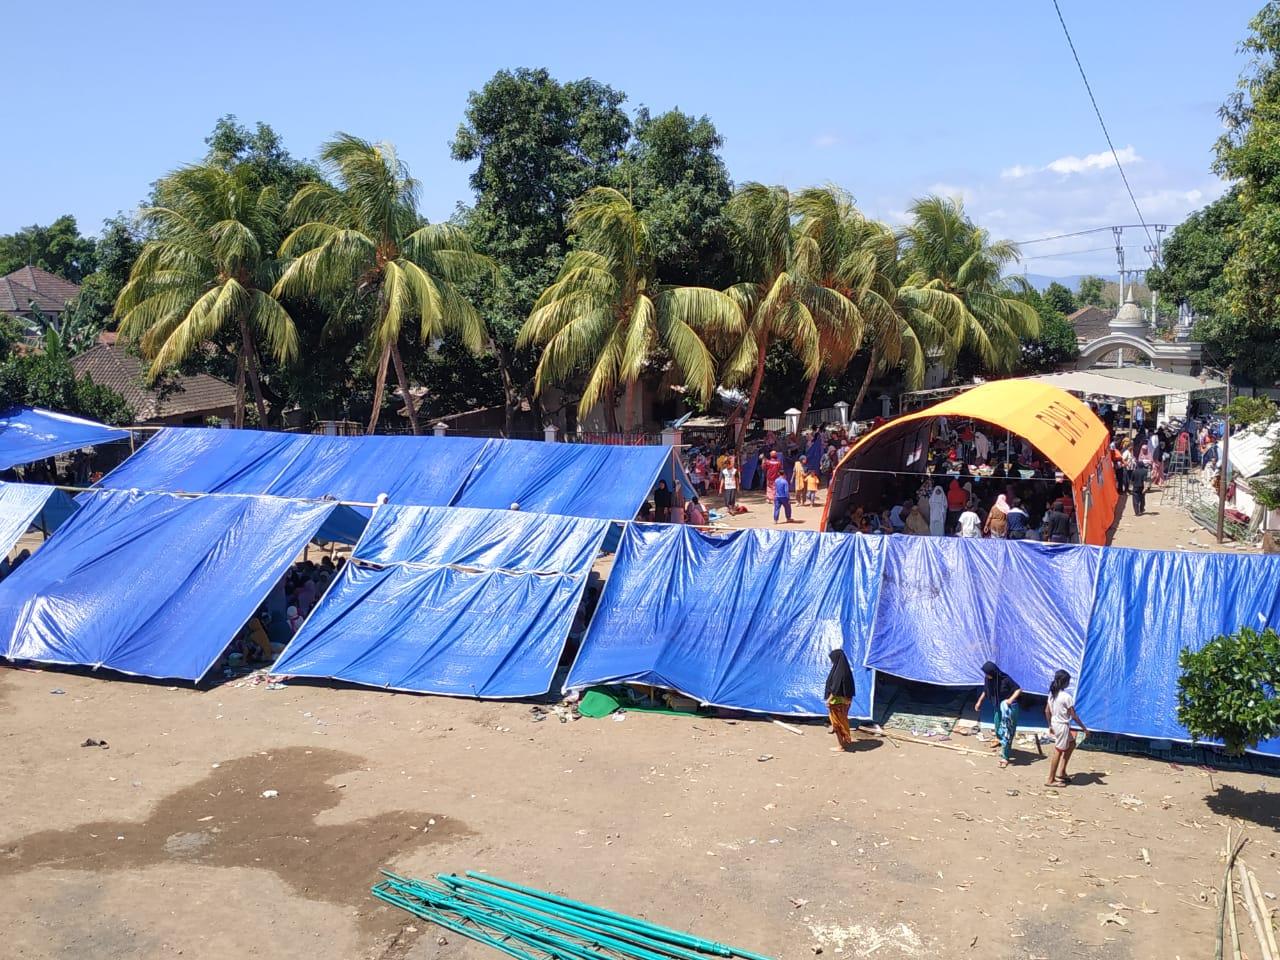 Gempa Lagi Di Lombok: Situasi Terkini di Pengungsian